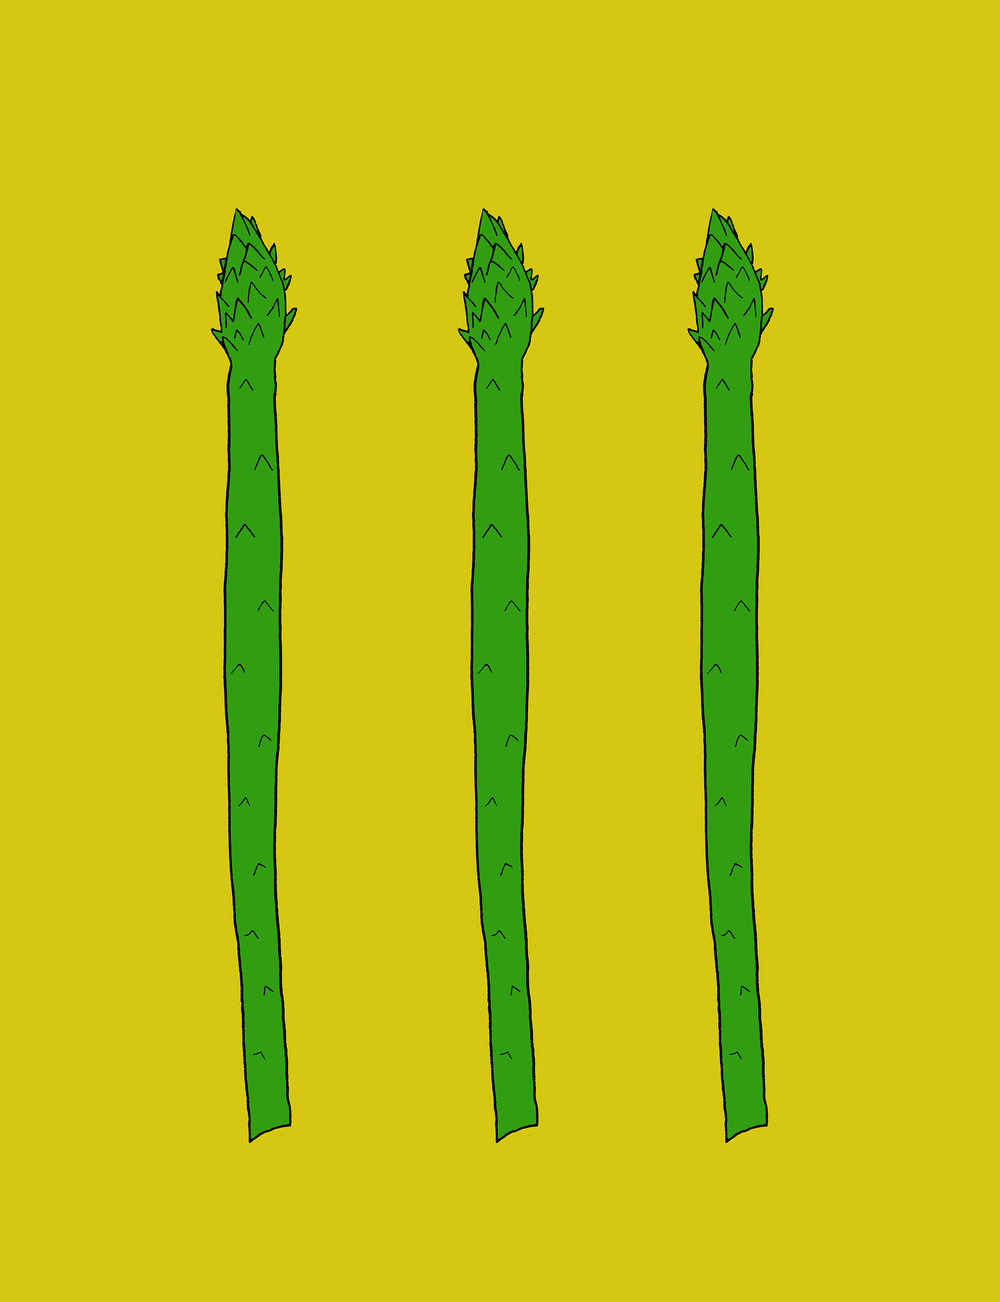 Asparagus Illustration by Emma Freeman Designs